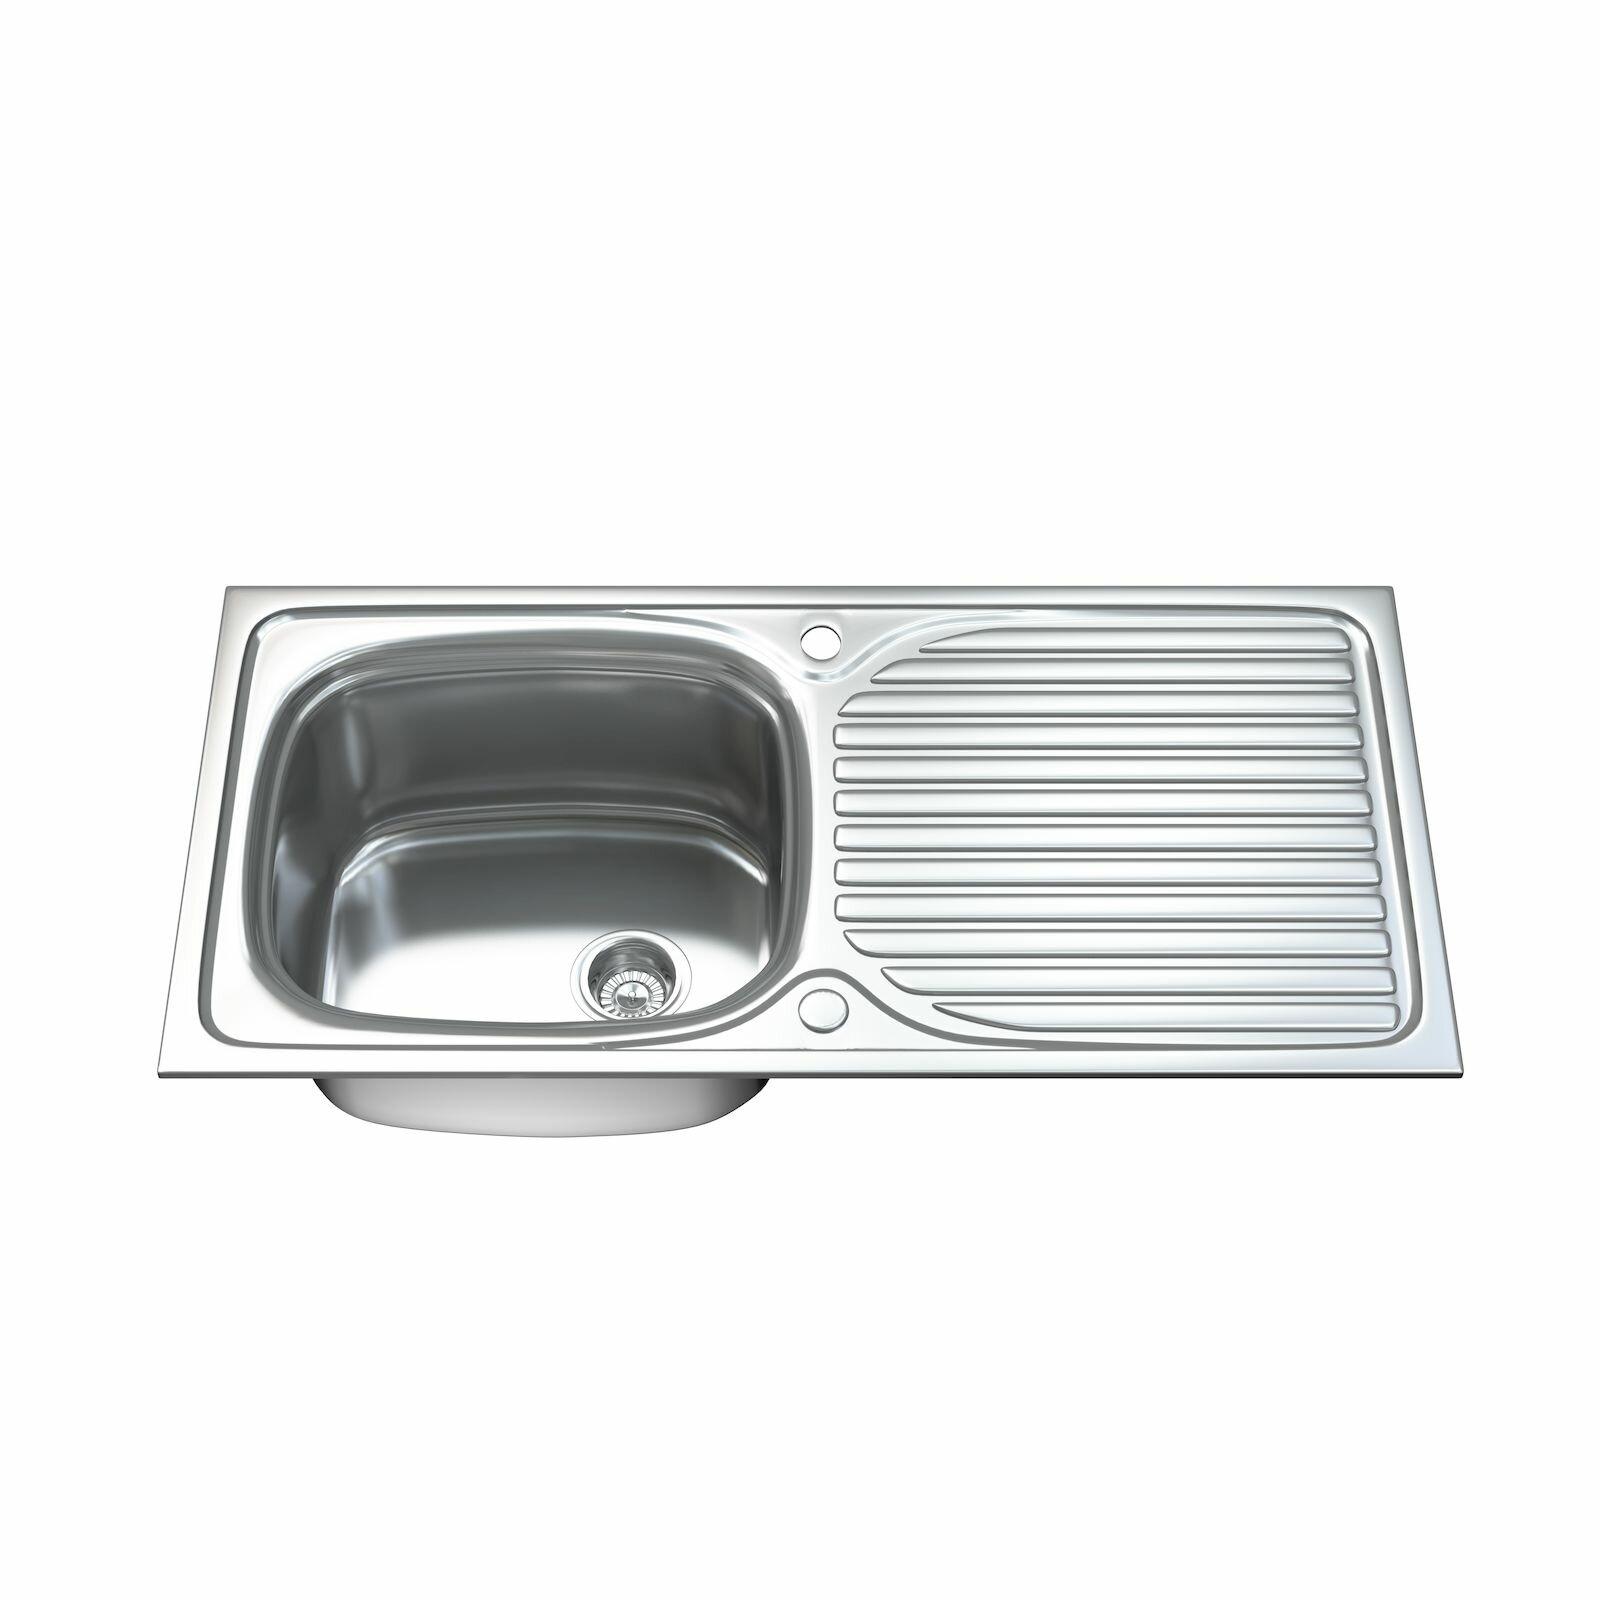 Dihl 100cm x 50cm Stainless Steel Kitchen Sink | Wayfair.co.uk